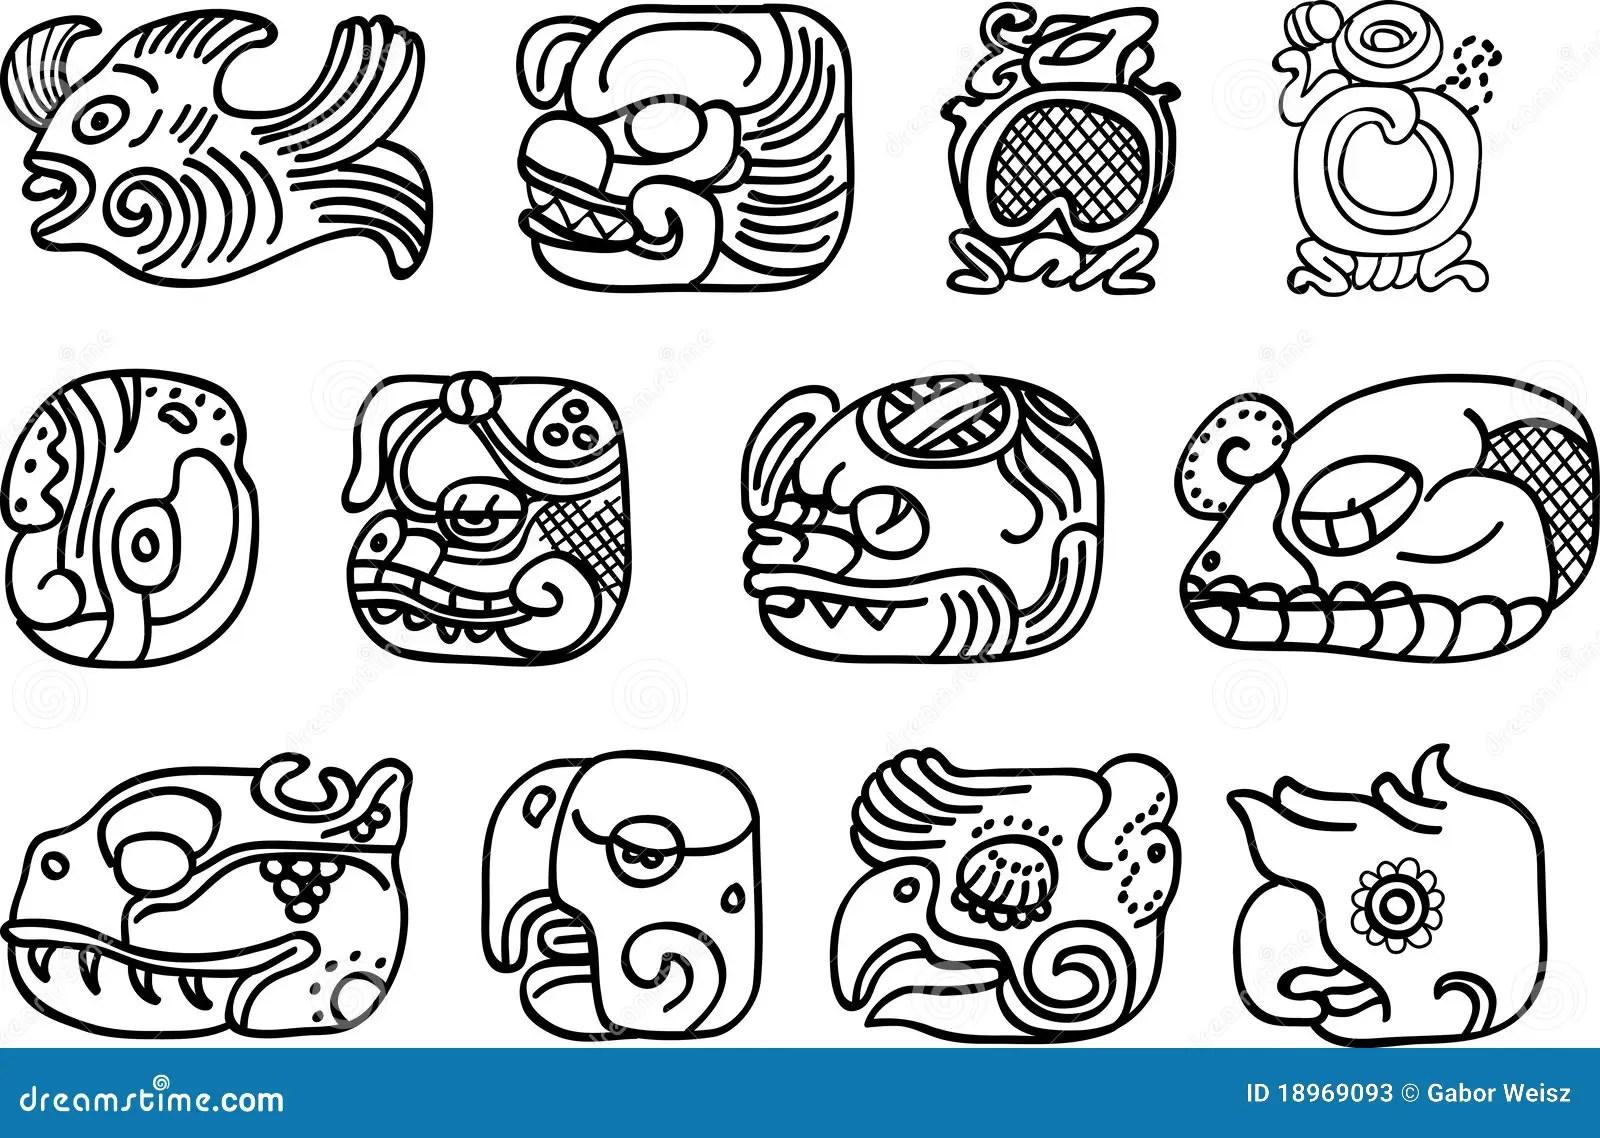 Mexican Aztec Or Maya Motifs Glyphs Stock Vector